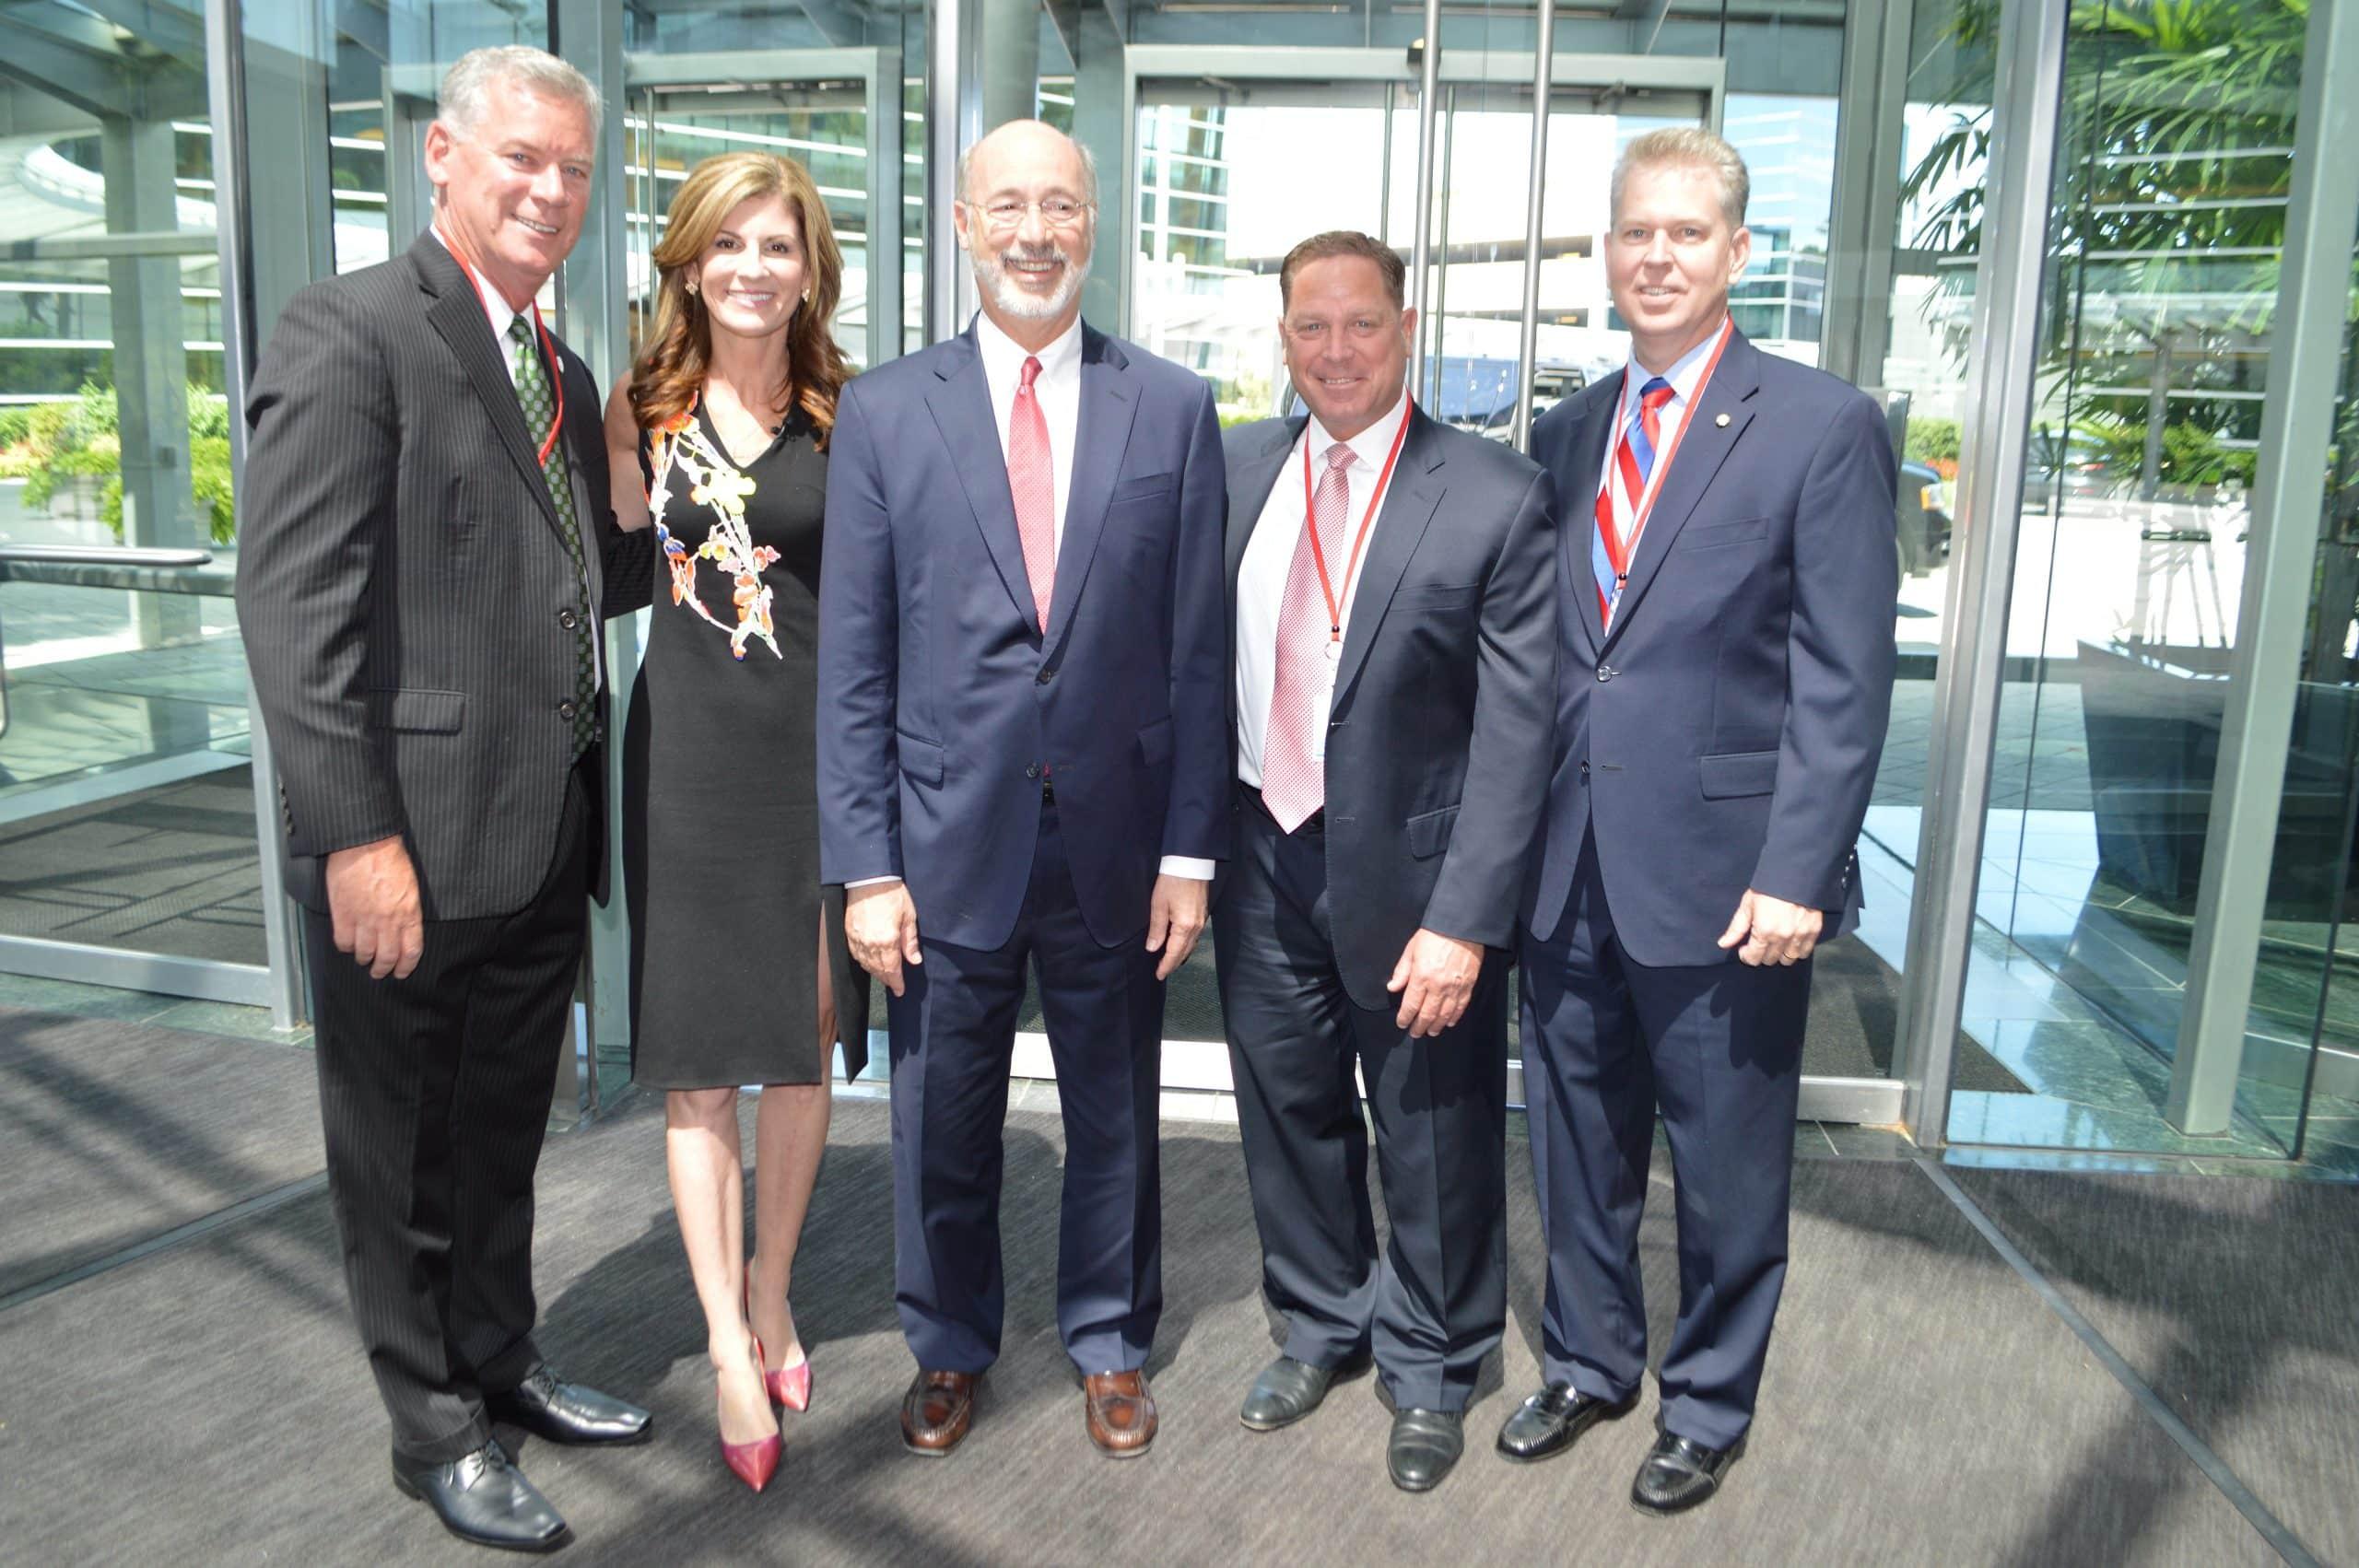 From left: State Senator Tom McGarrigle, SAP North America President Jennifer Morgan, Governor Tom Wolf, Delaware County Councilman Dave White and State Representative Chris Quinn.